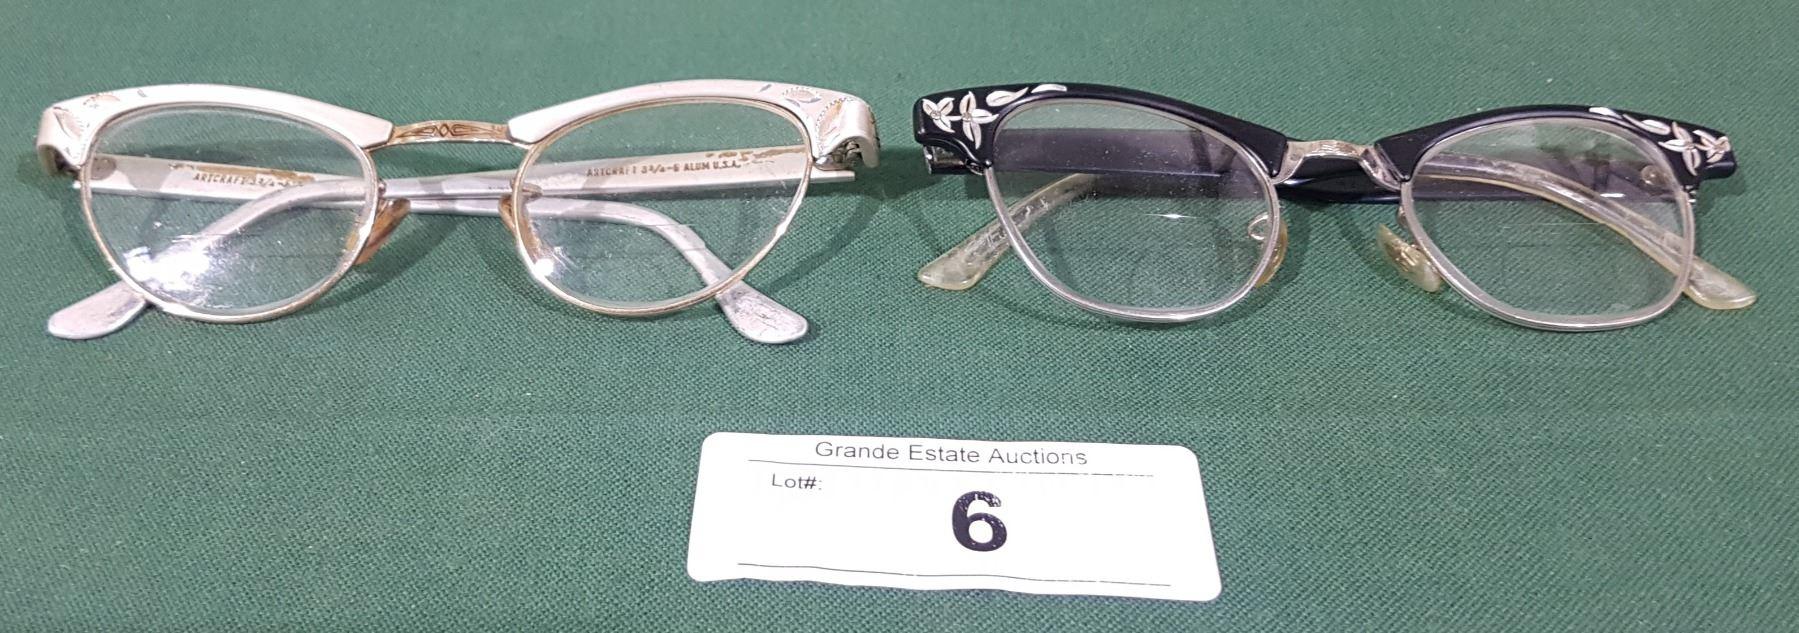 f7ae93d423d Image 1   2 PAIRS OF VINTAGE ART CRAFT LADIES CAT-EYE GLASSES